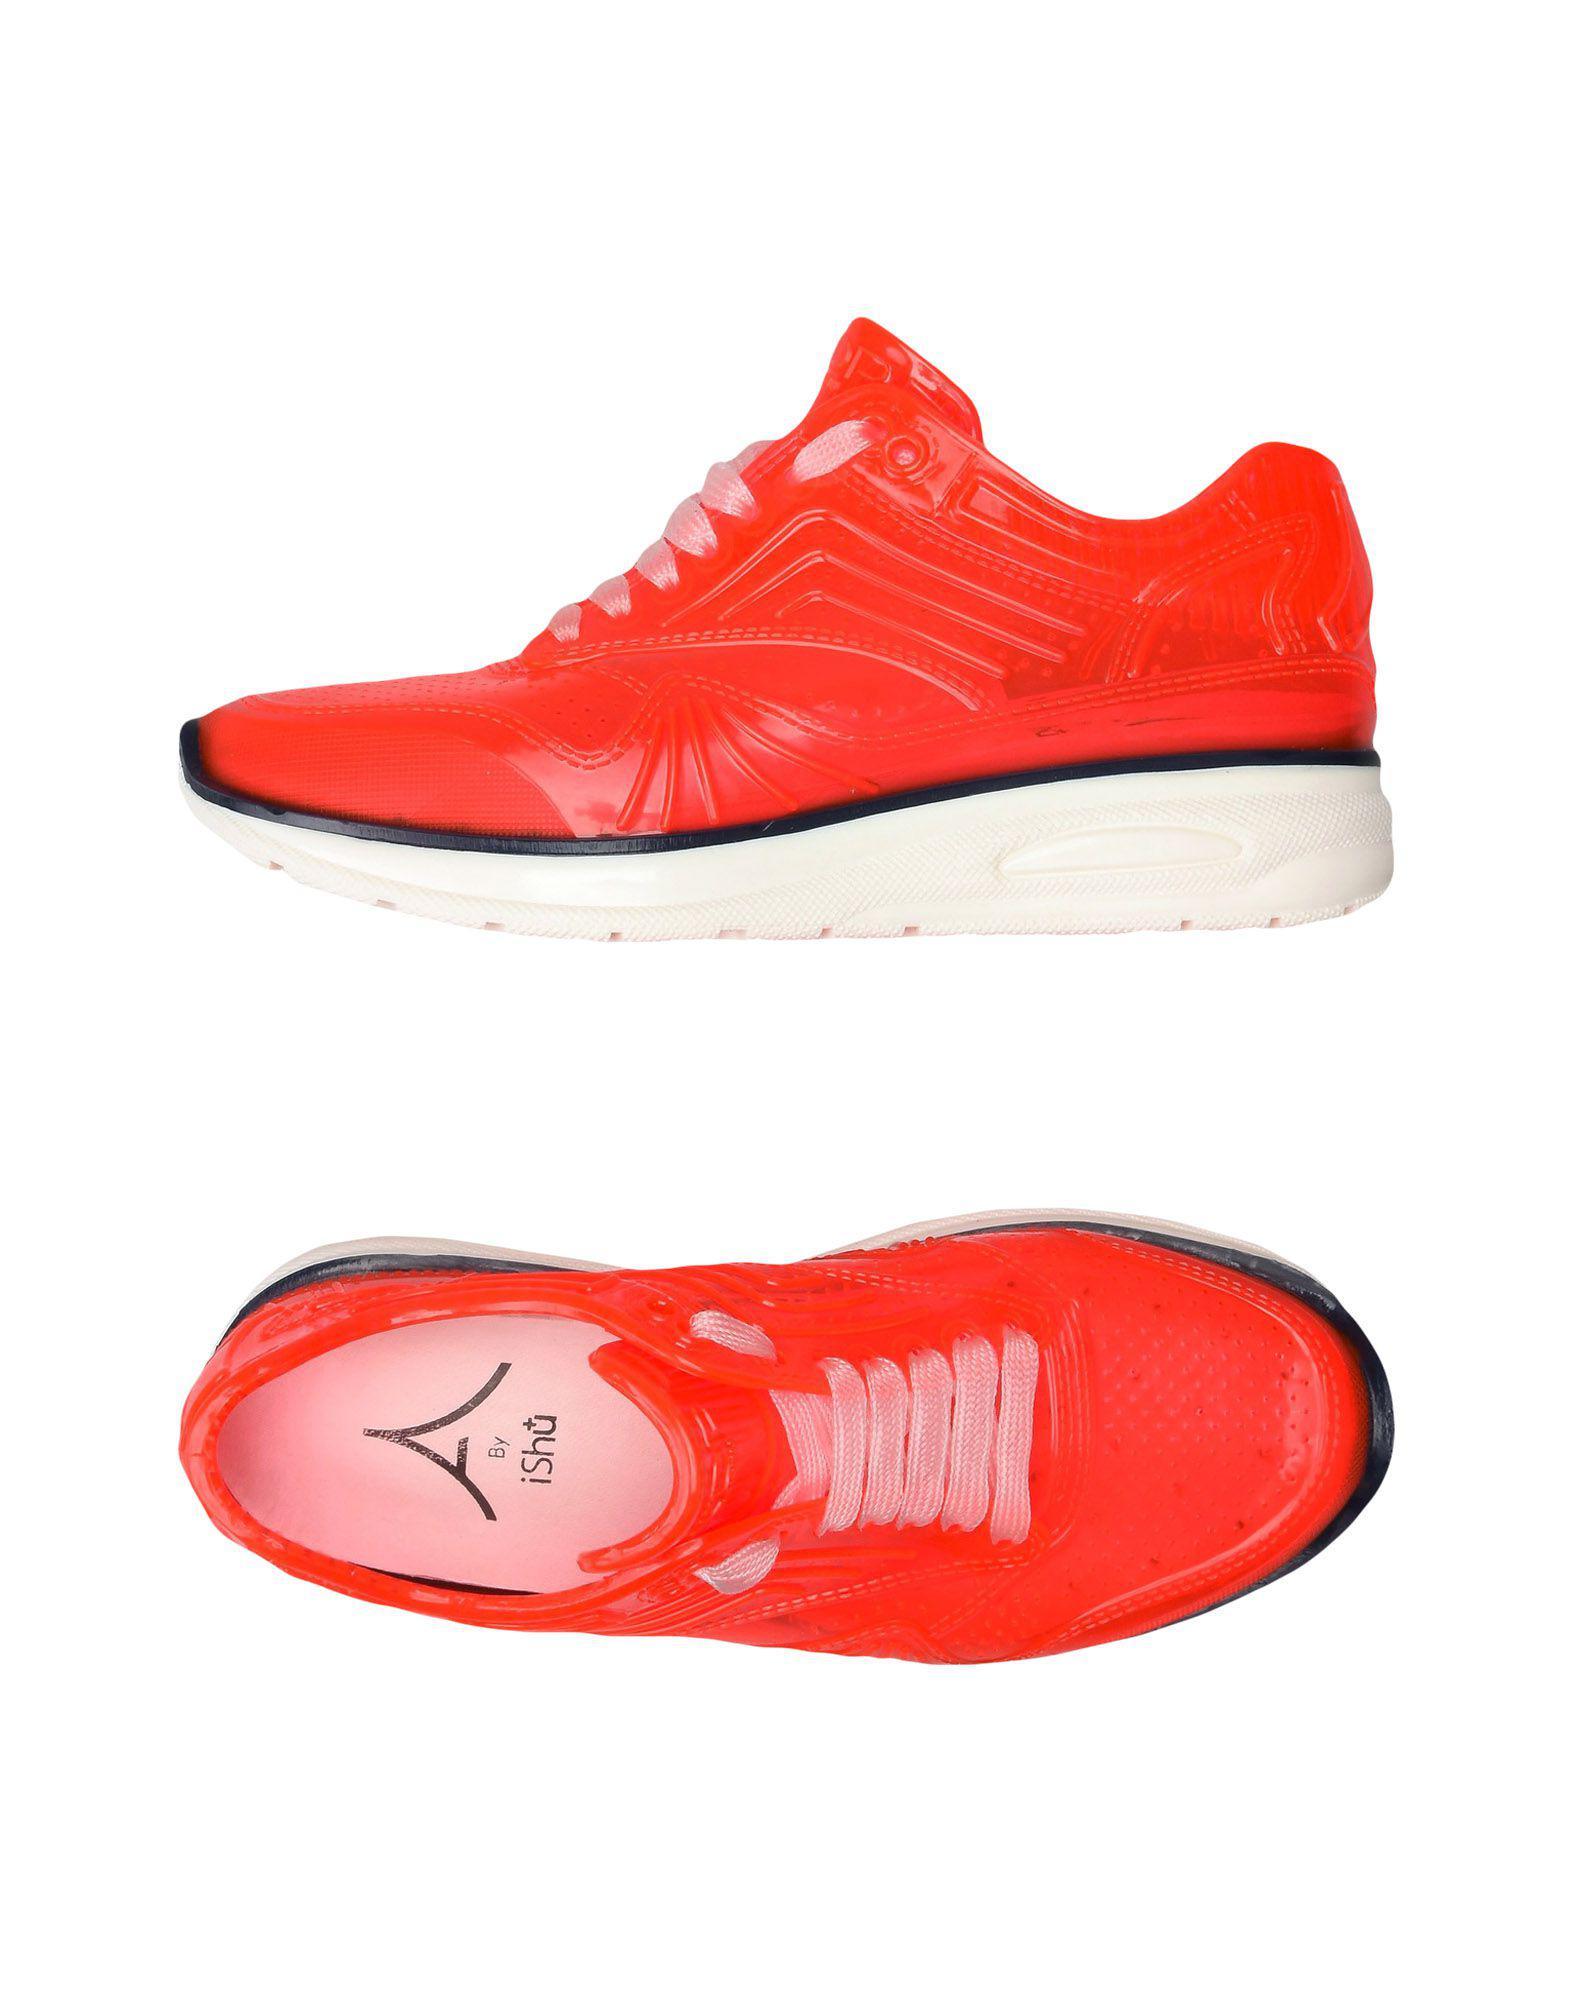 Ishu + Bas-tops Et Chaussures De Sport Kj4VWE